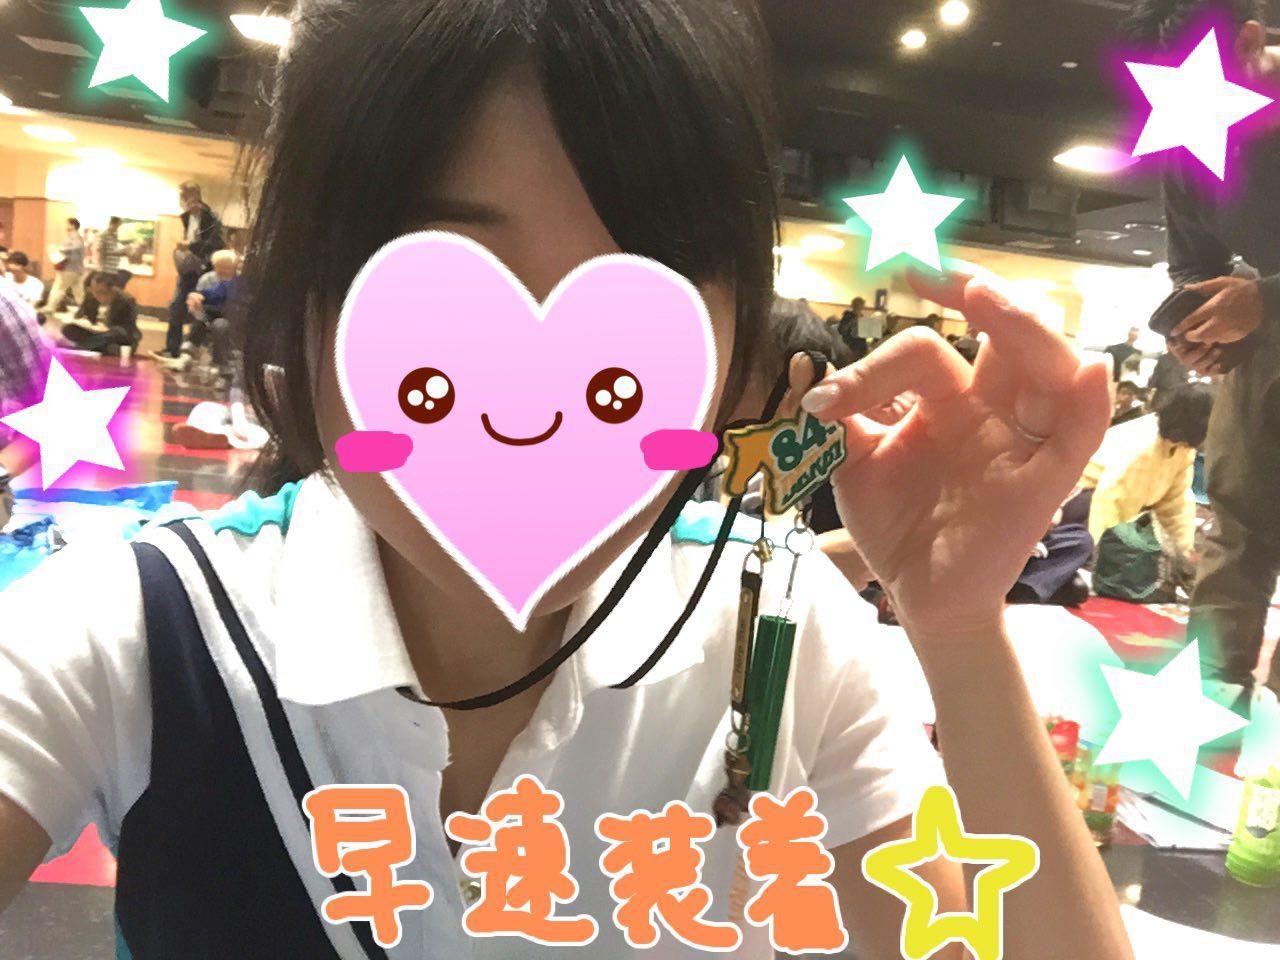 photo_2017-05-07_21-24-28.jpg